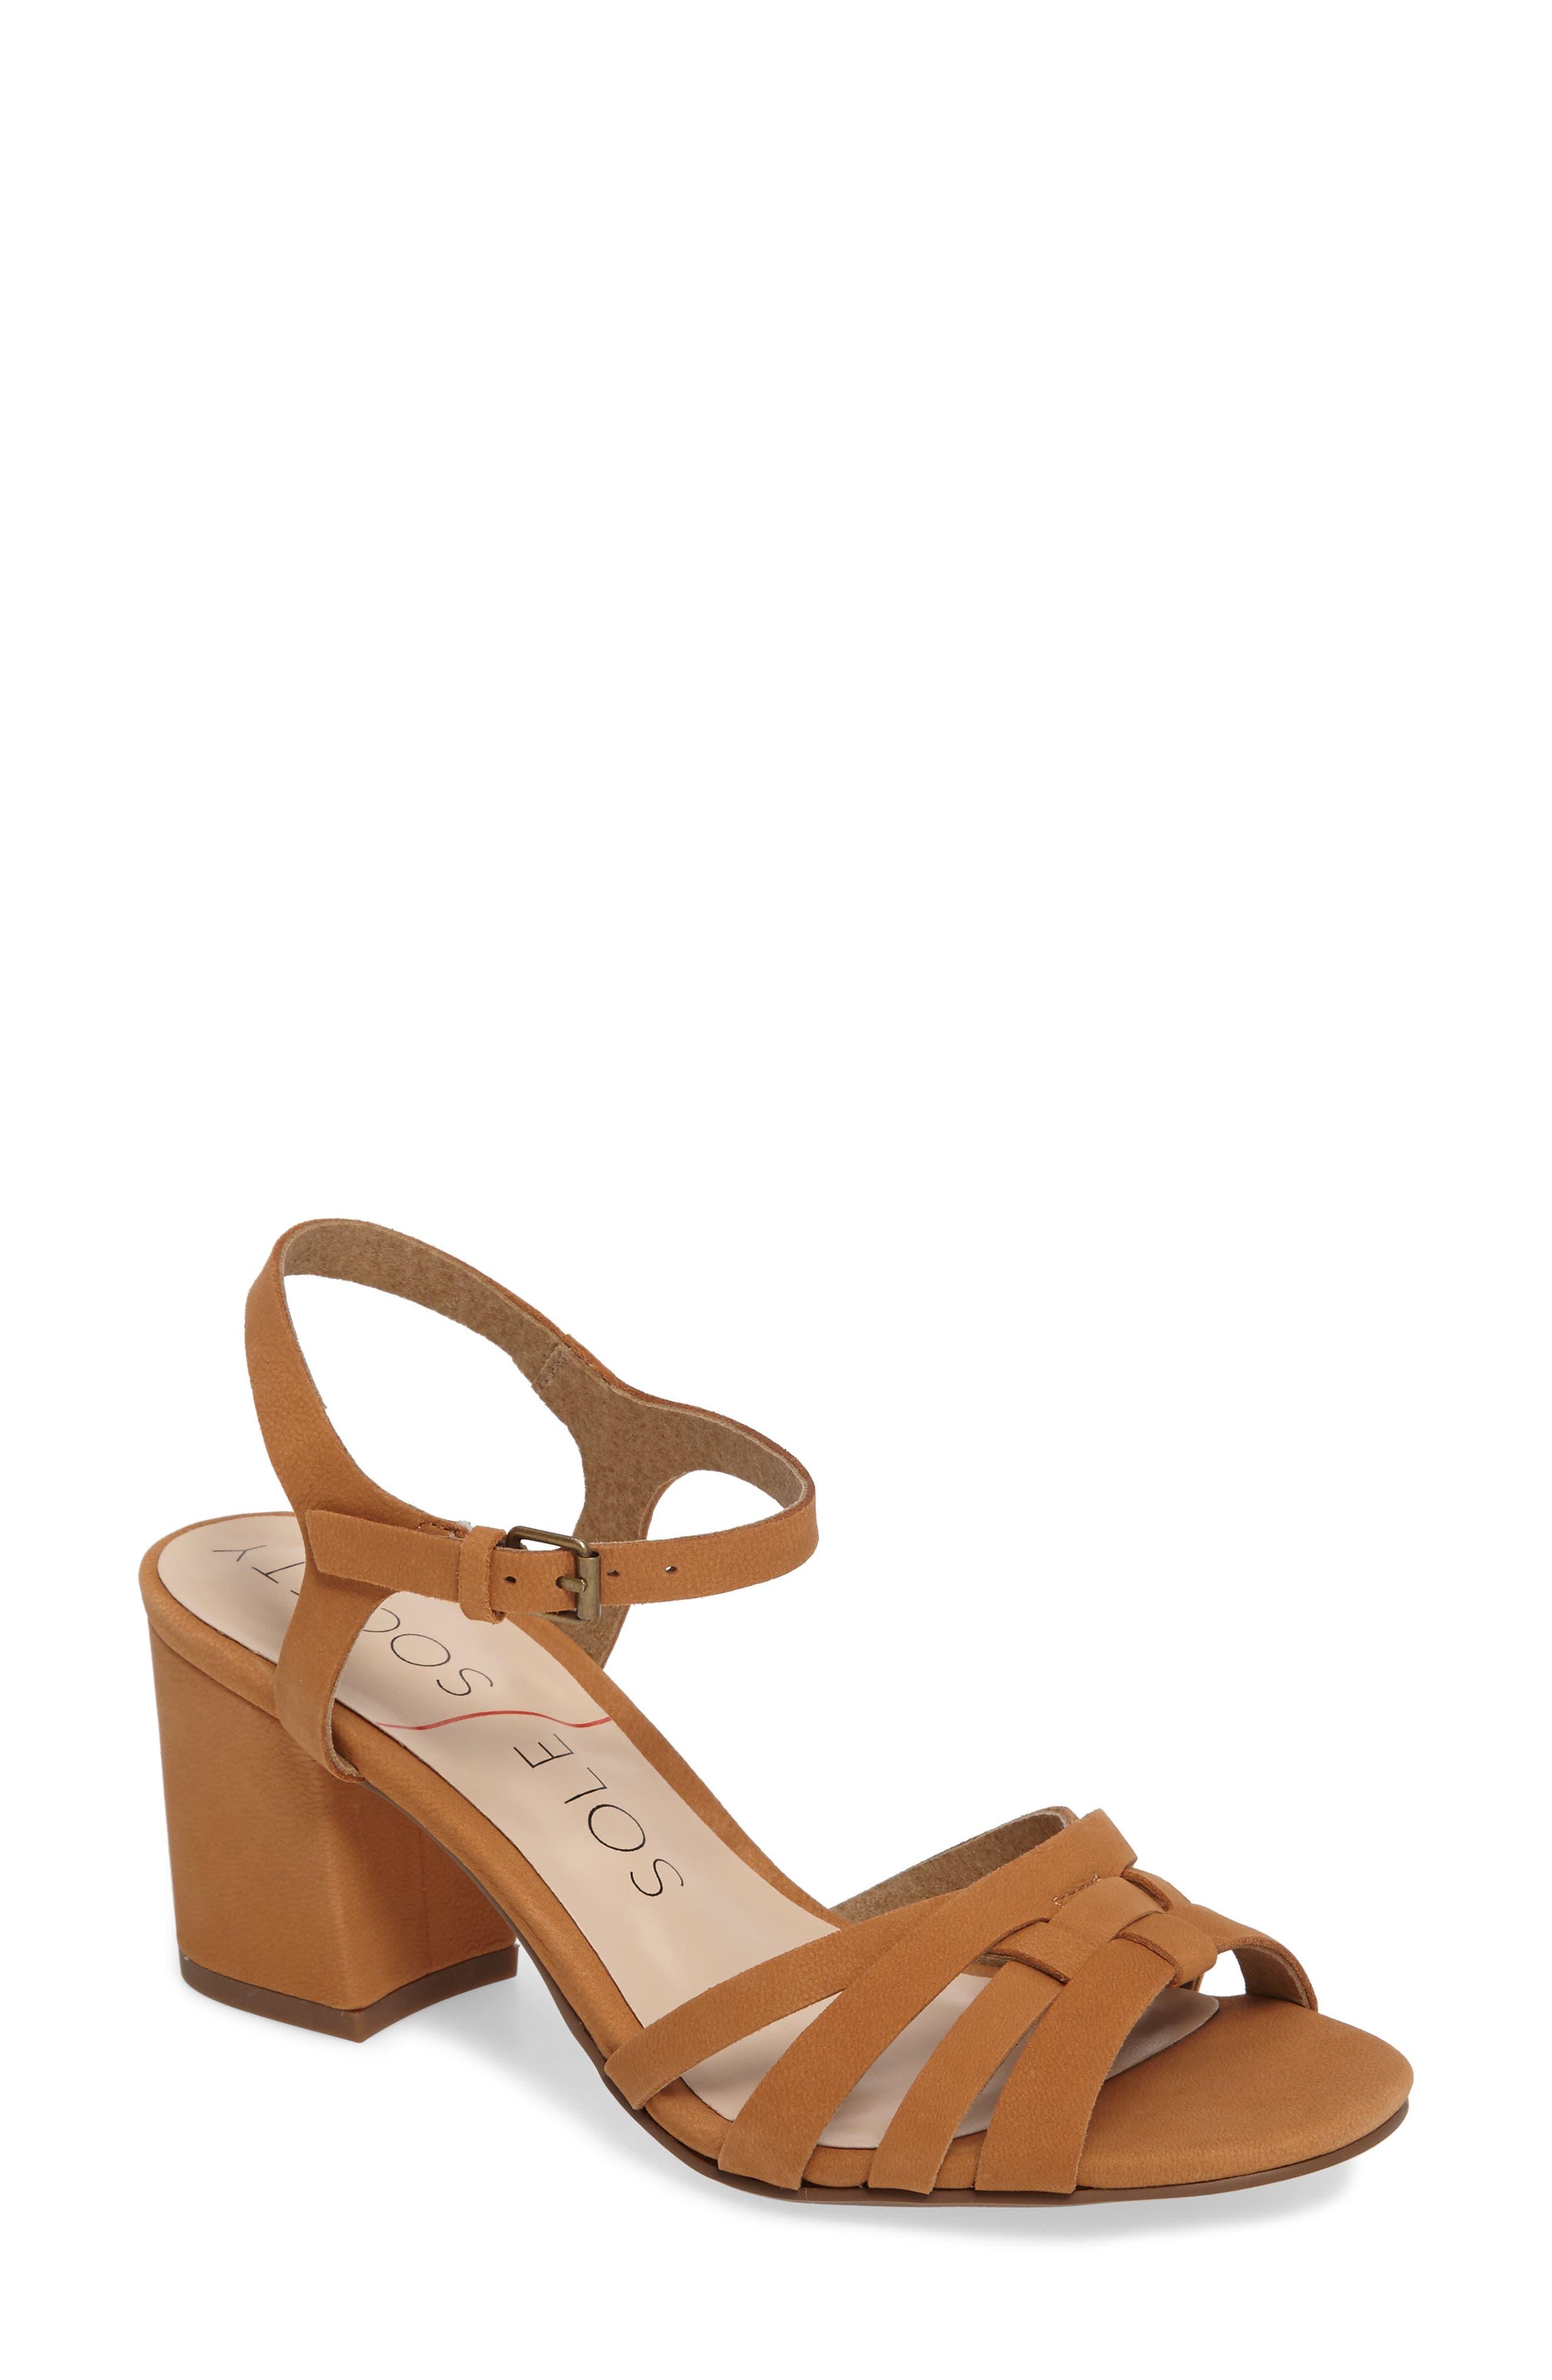 SOLE SOCIETY Paulina Block Heel Sandal